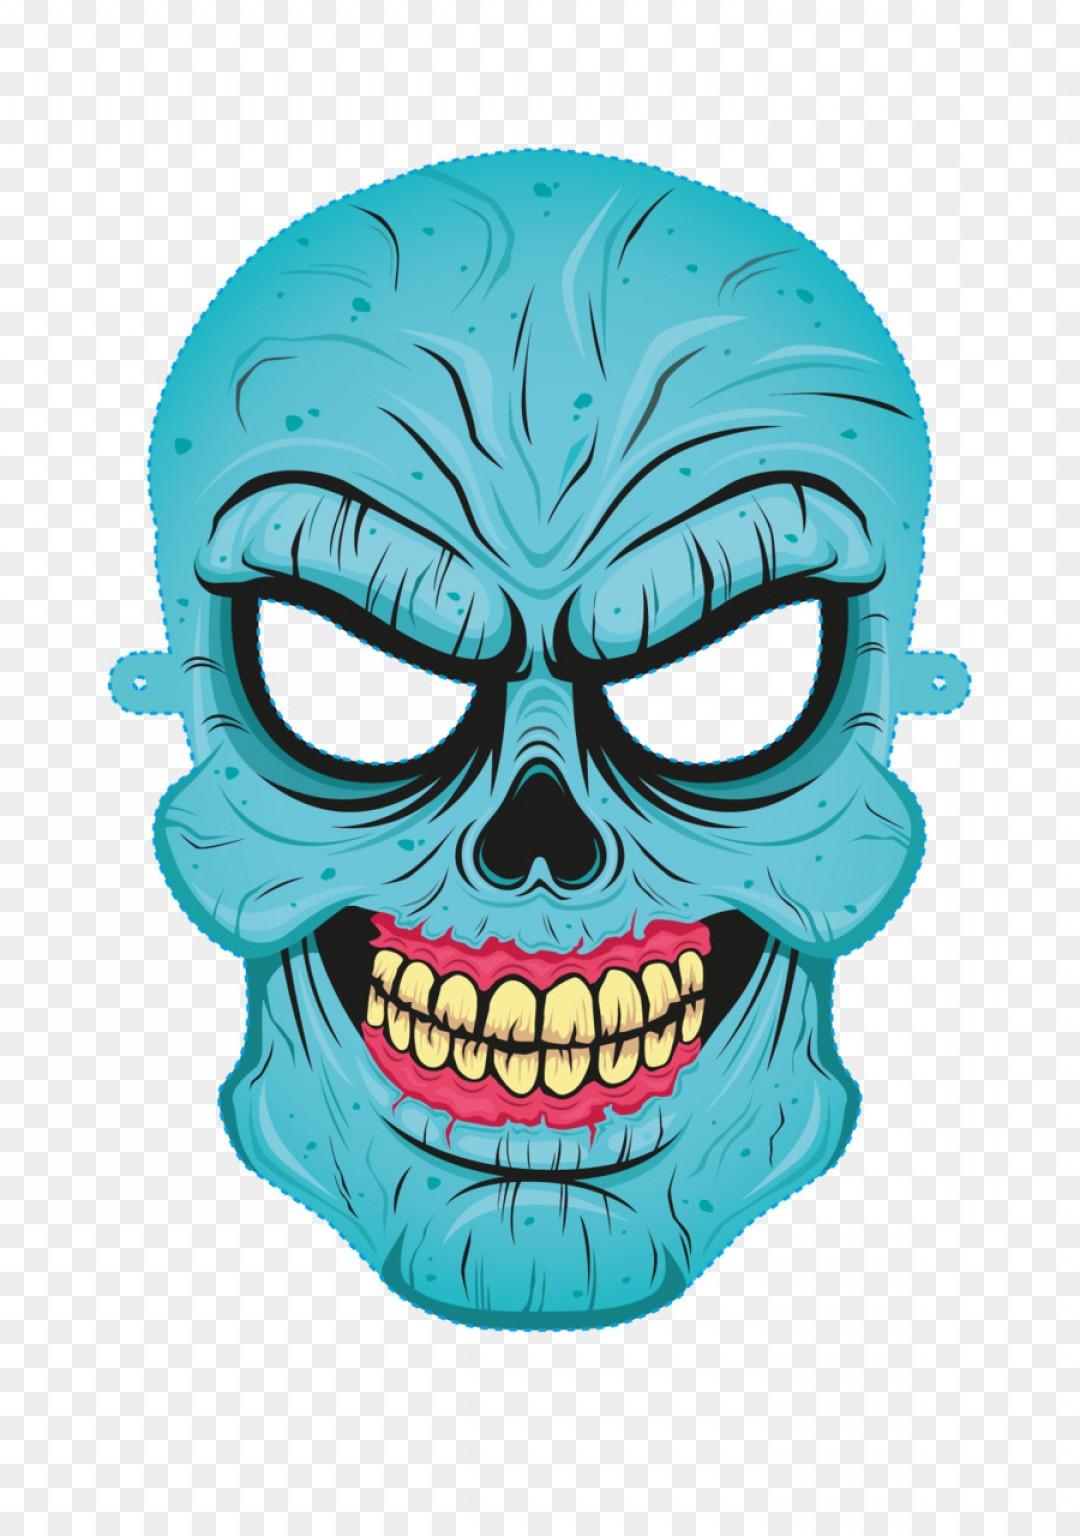 1080x1536 Png Halloween Costume Mask Euclidean Vector Zombie Vec Shopatcloth